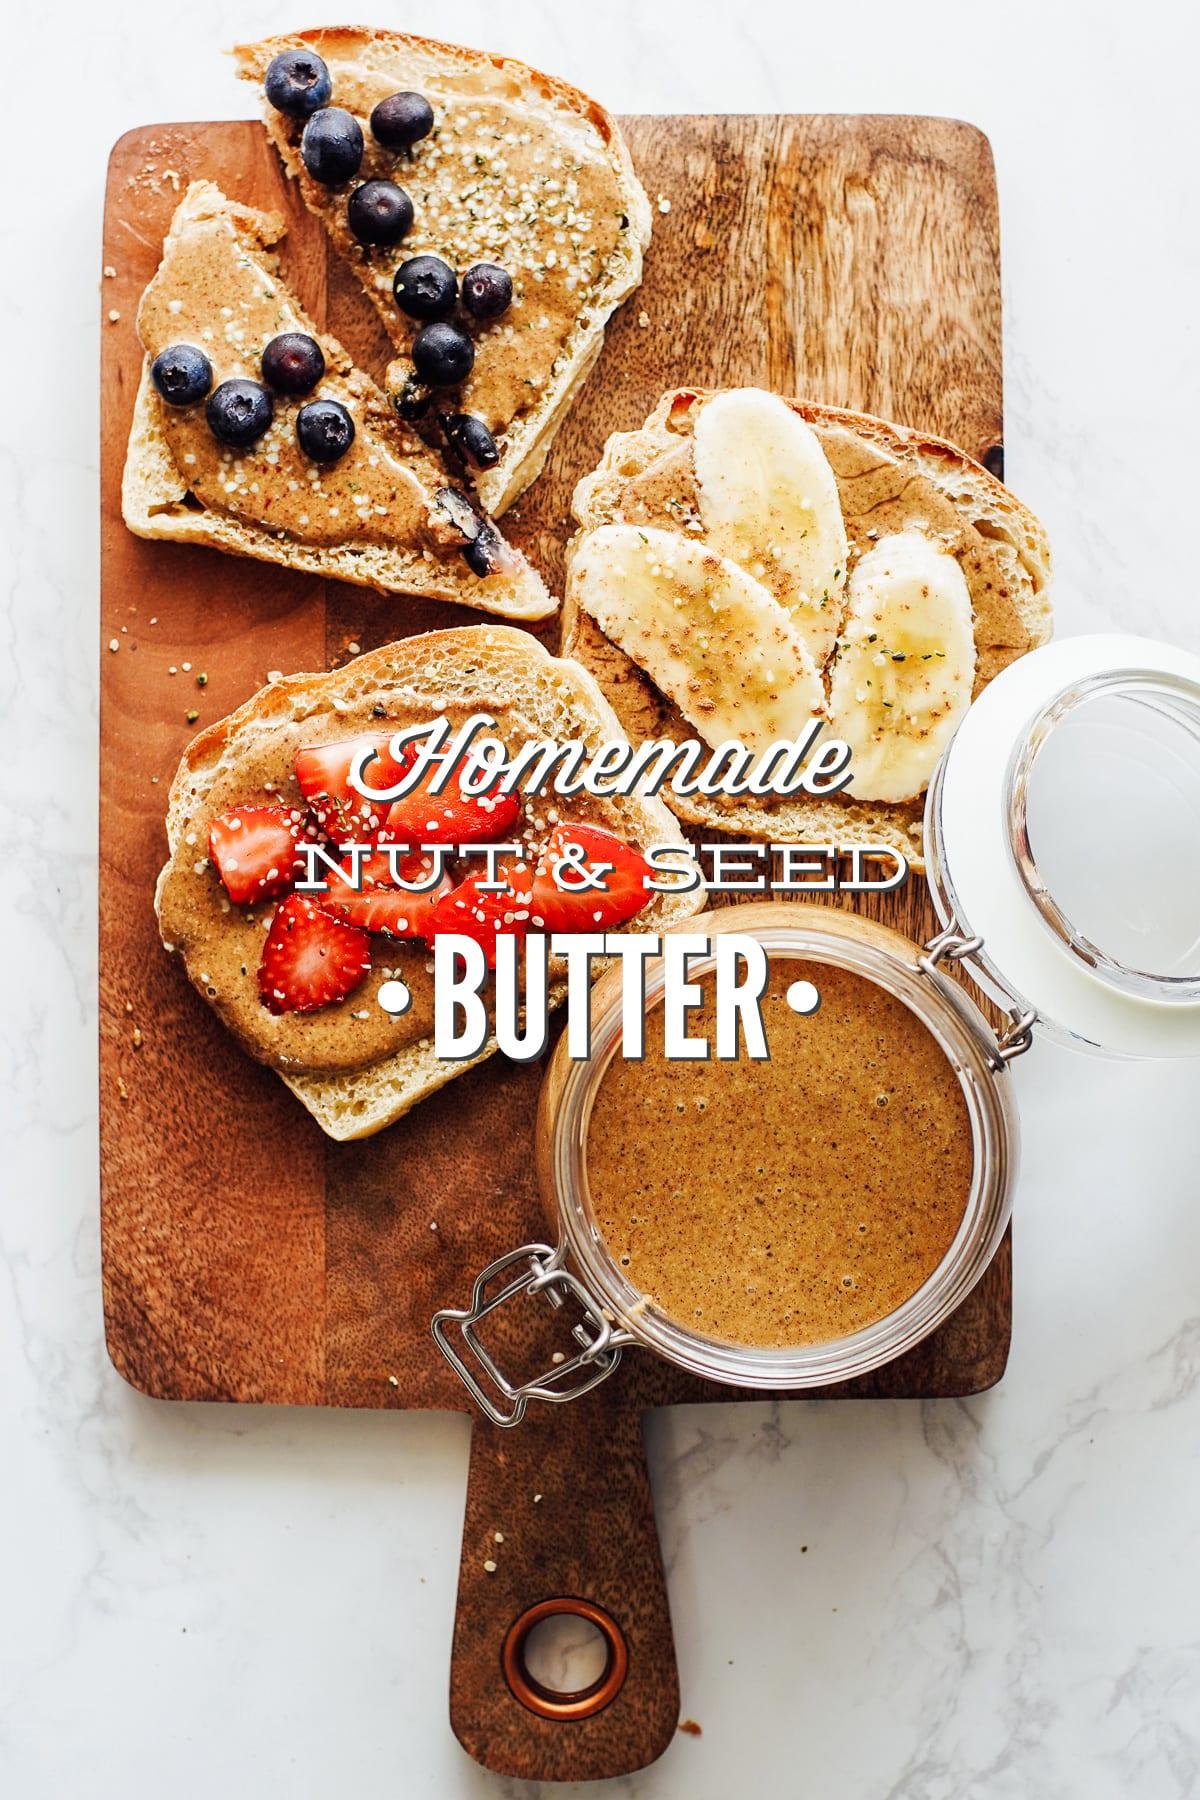 Homemade Nut and Seed Butter (Hazelnut and Pumpkin Seed Butter)